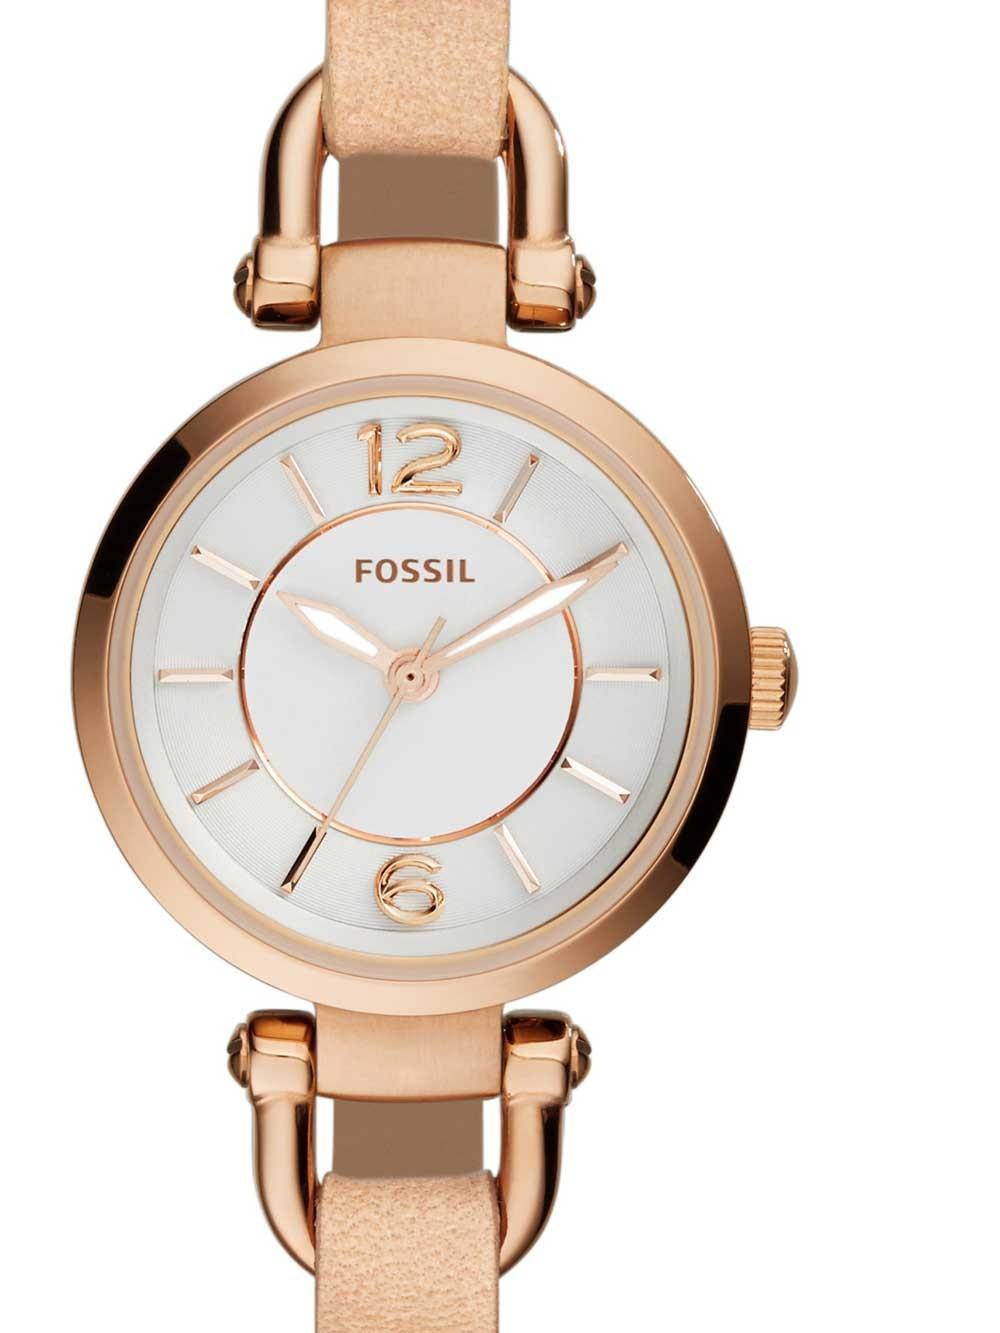 watches chrono12 fossil es3745 georgia damen 26mm 5atm. Black Bedroom Furniture Sets. Home Design Ideas